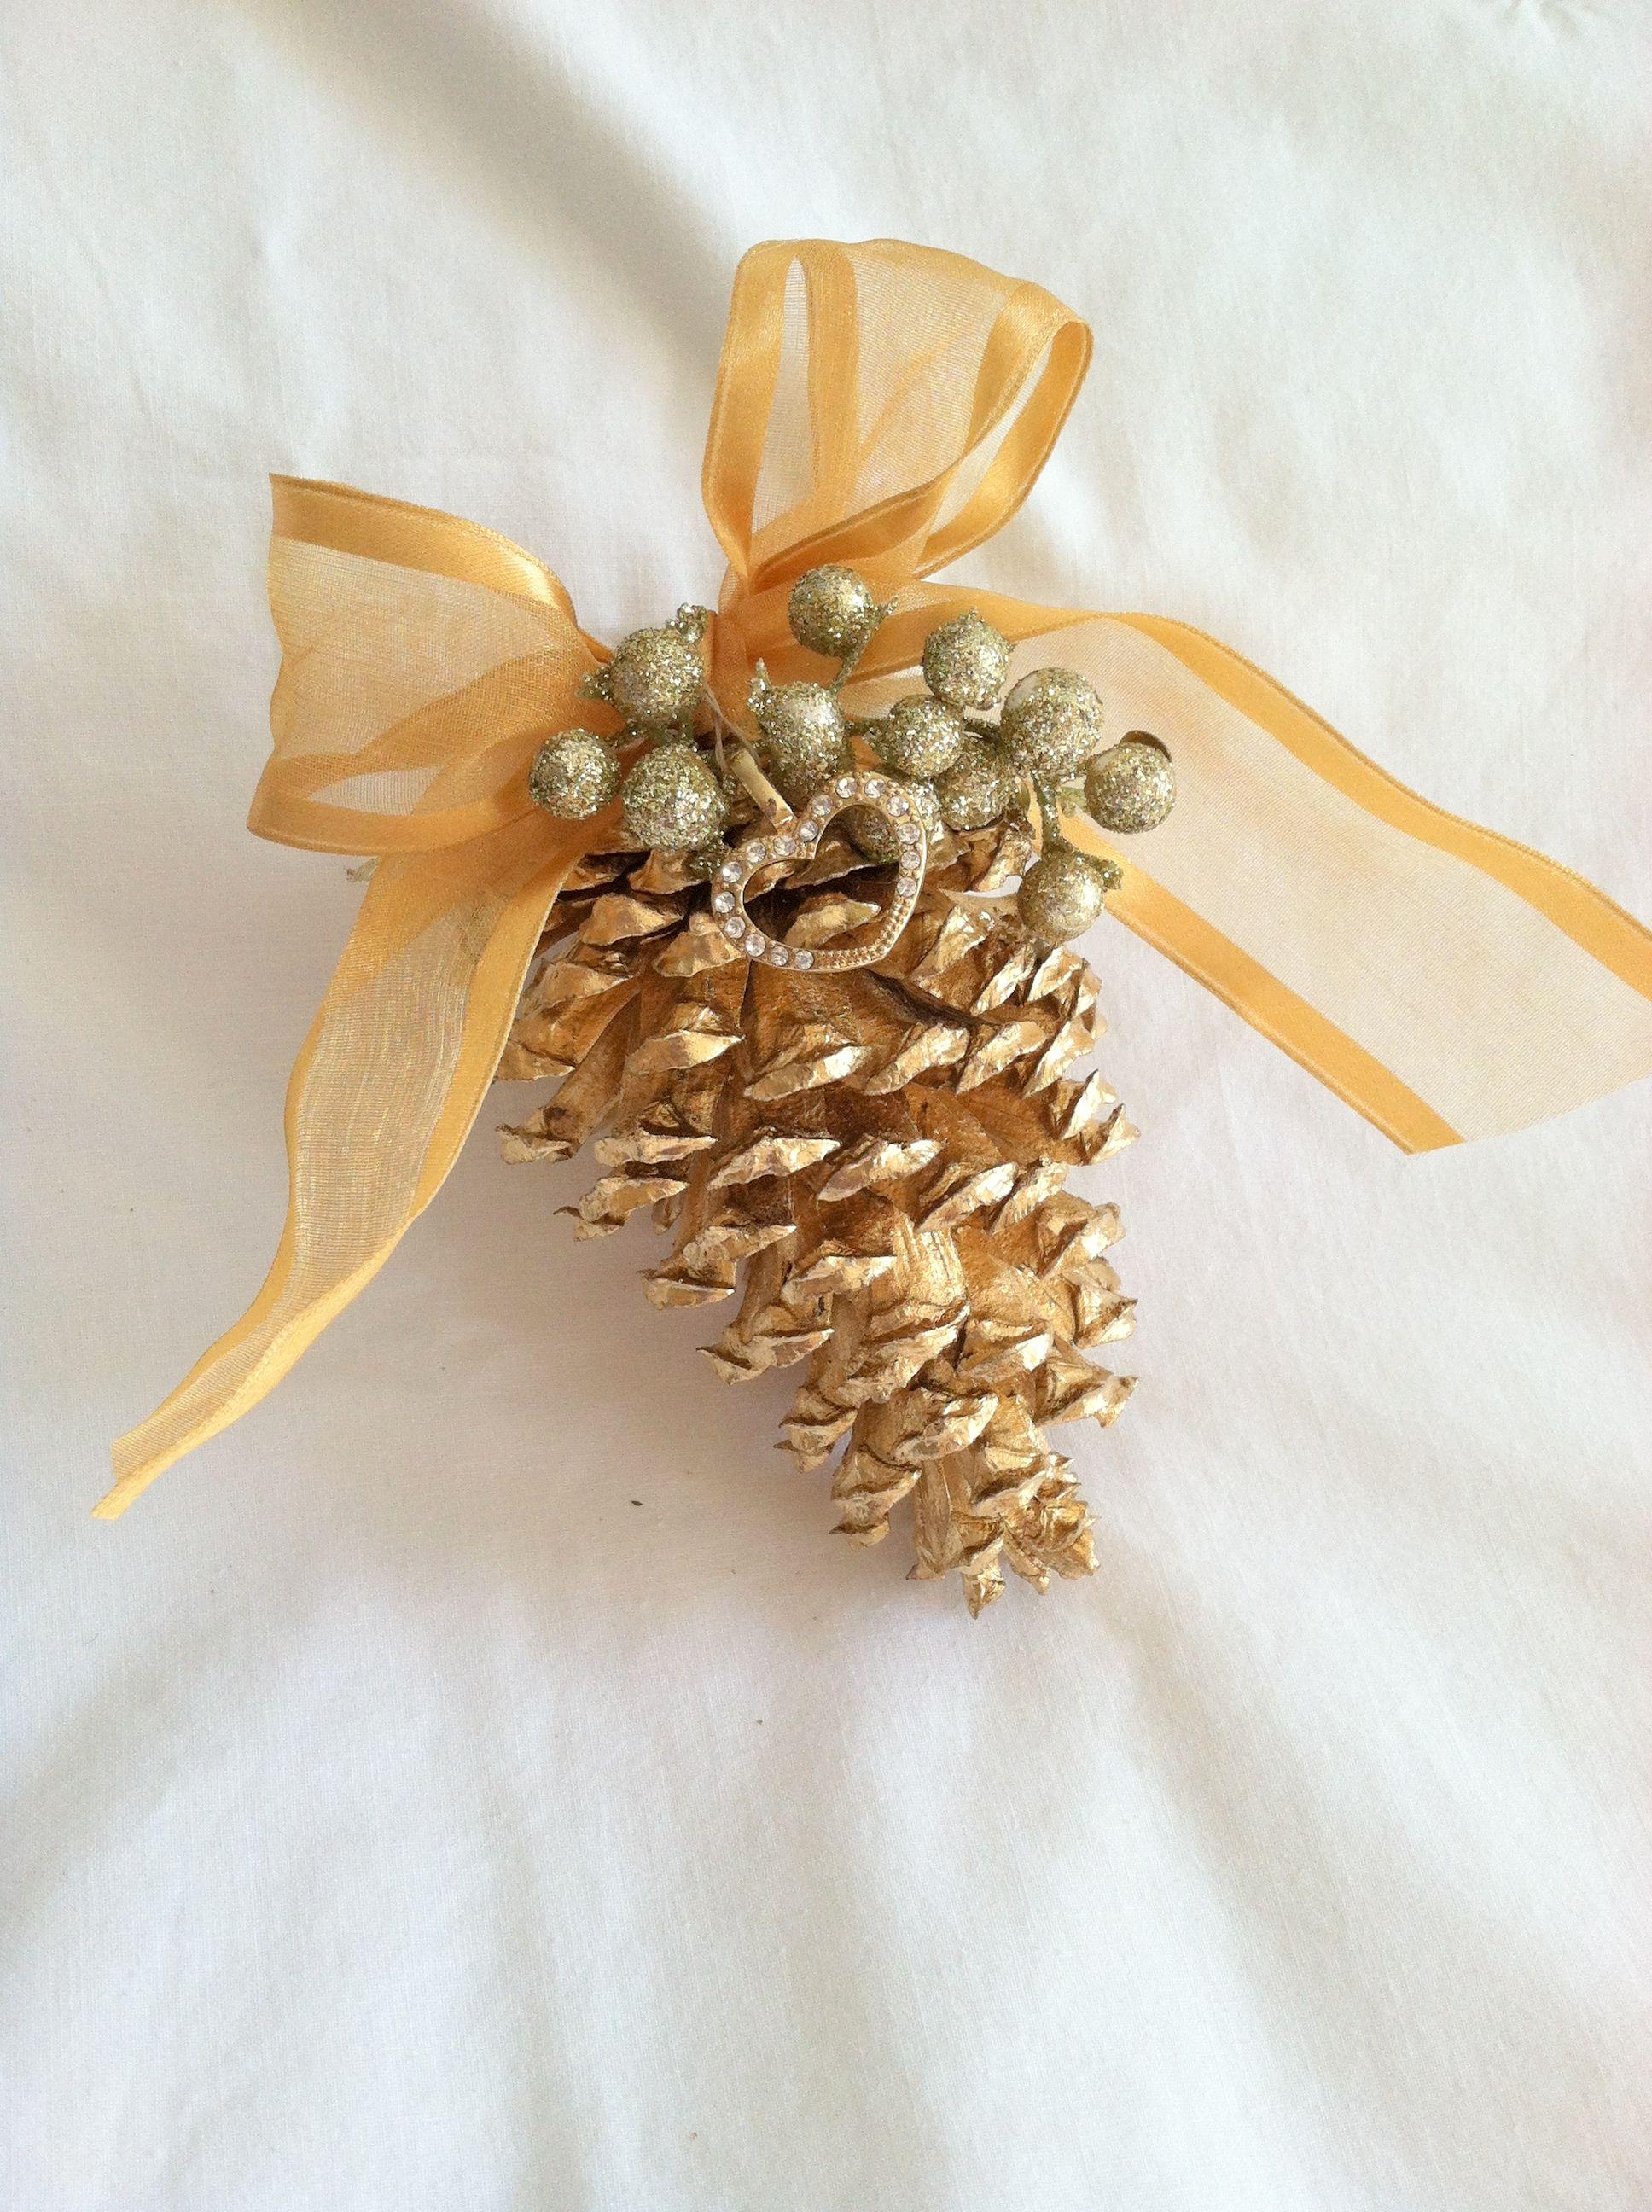 Pine Cone Christmas Crafts Pinterest